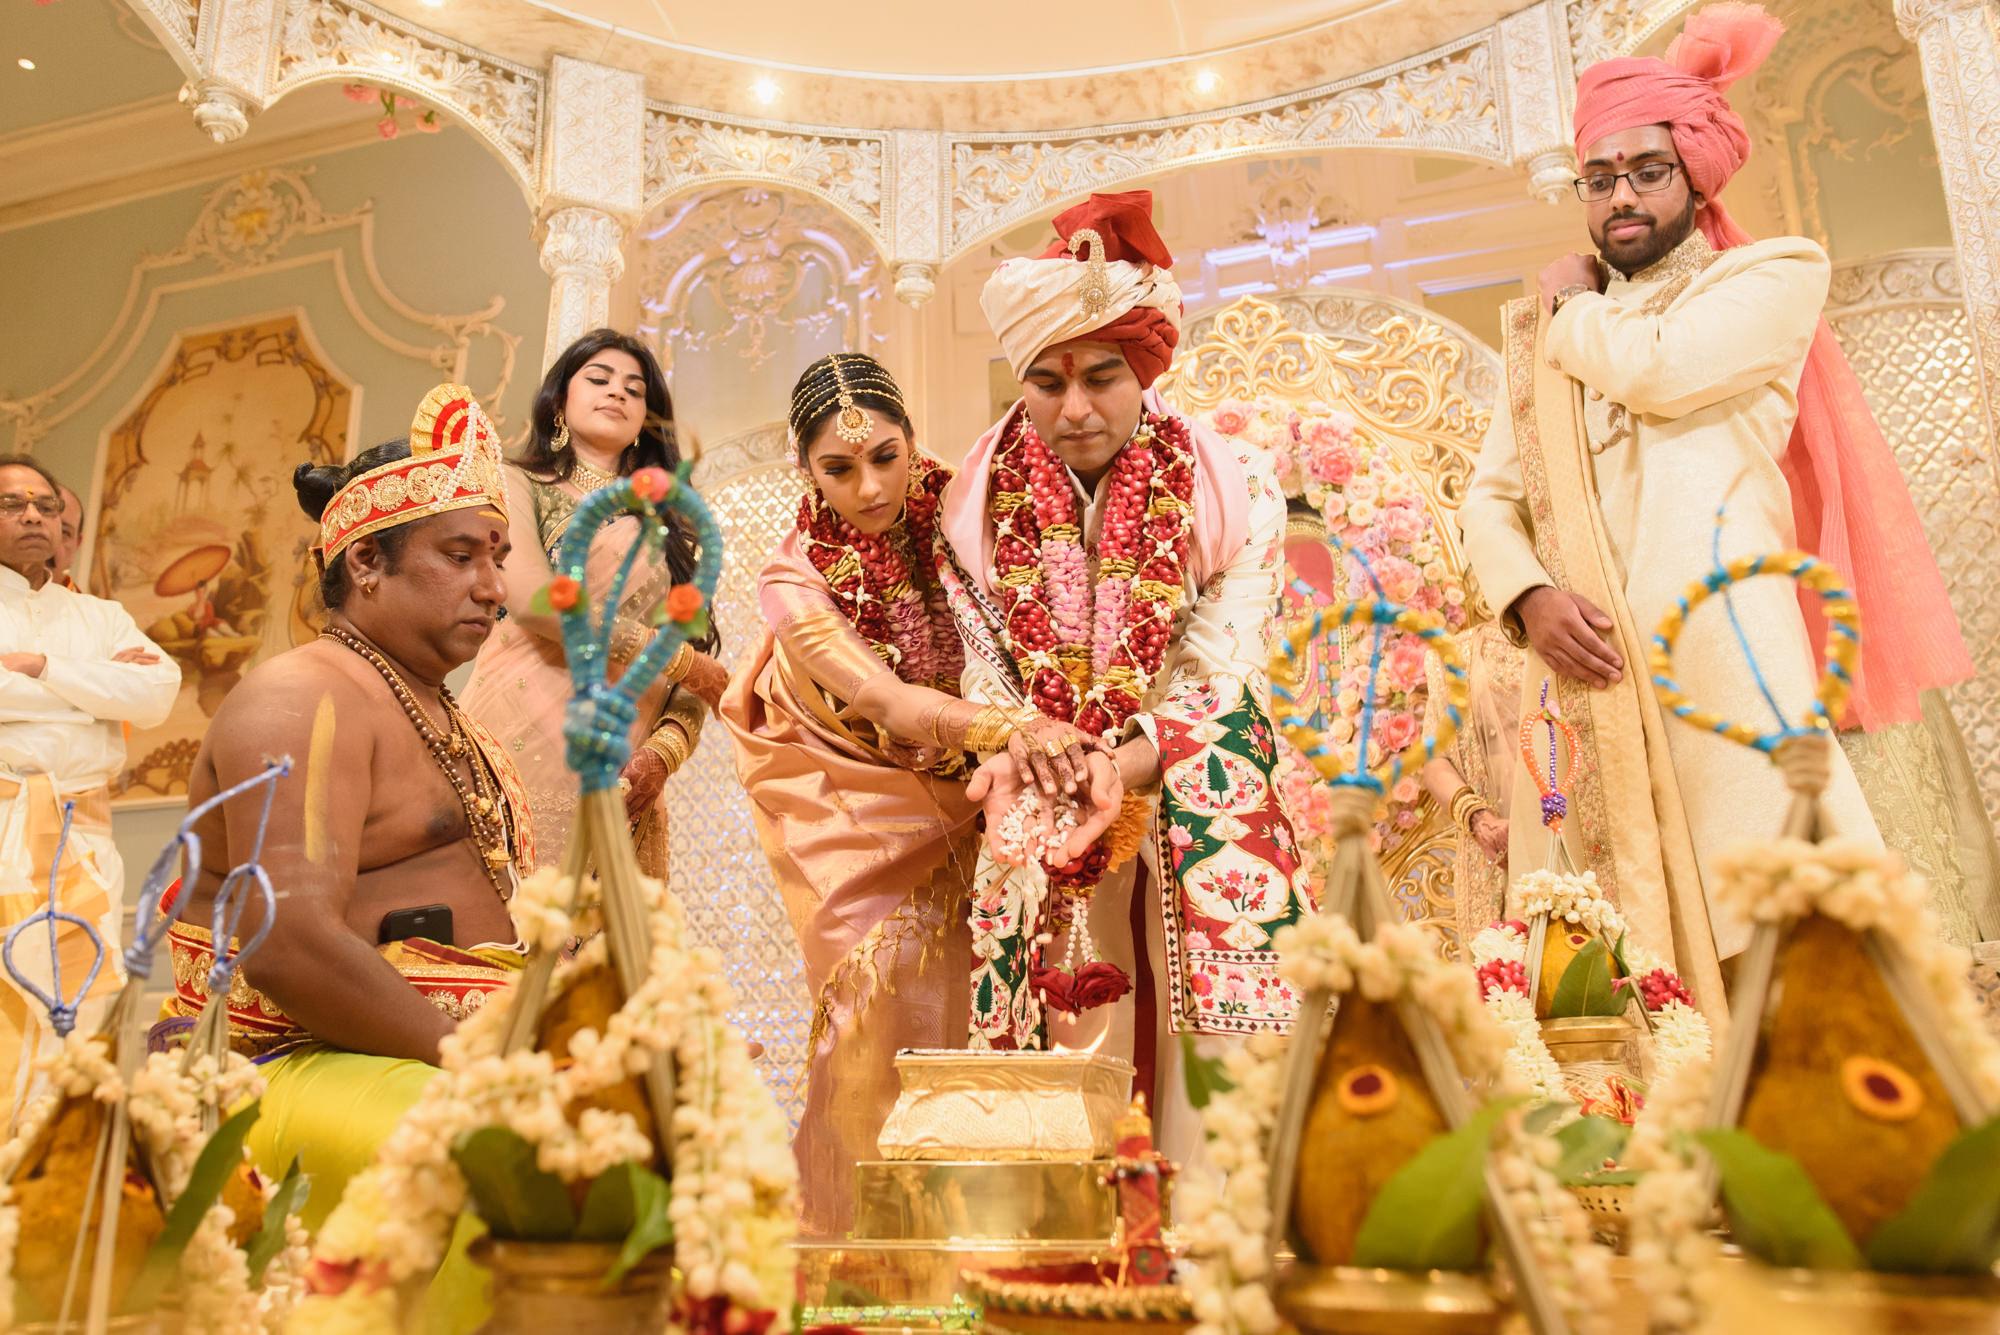 Tamil Gujrati hindu wedding photography photographer london the savoy -57.jpg